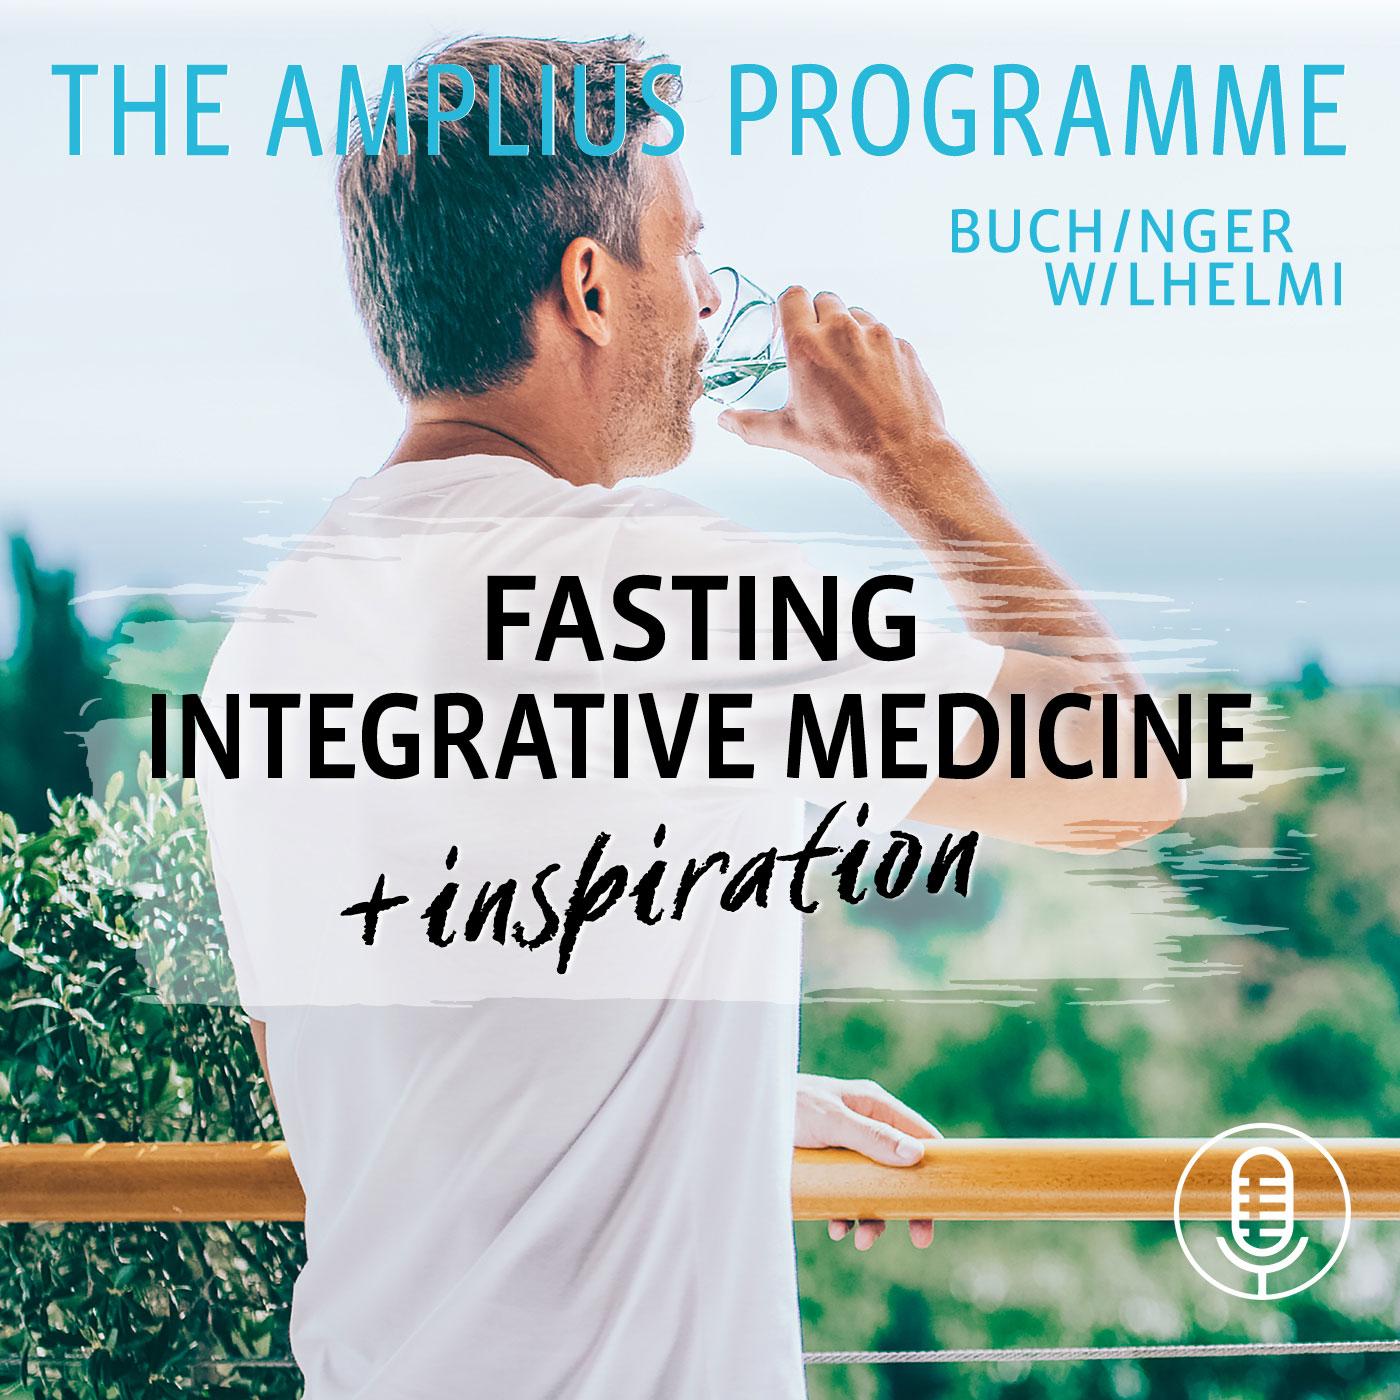 Fasting, Integrative Medicine and Inspiration - The Buchinger Wilhelmi Amplius Programme